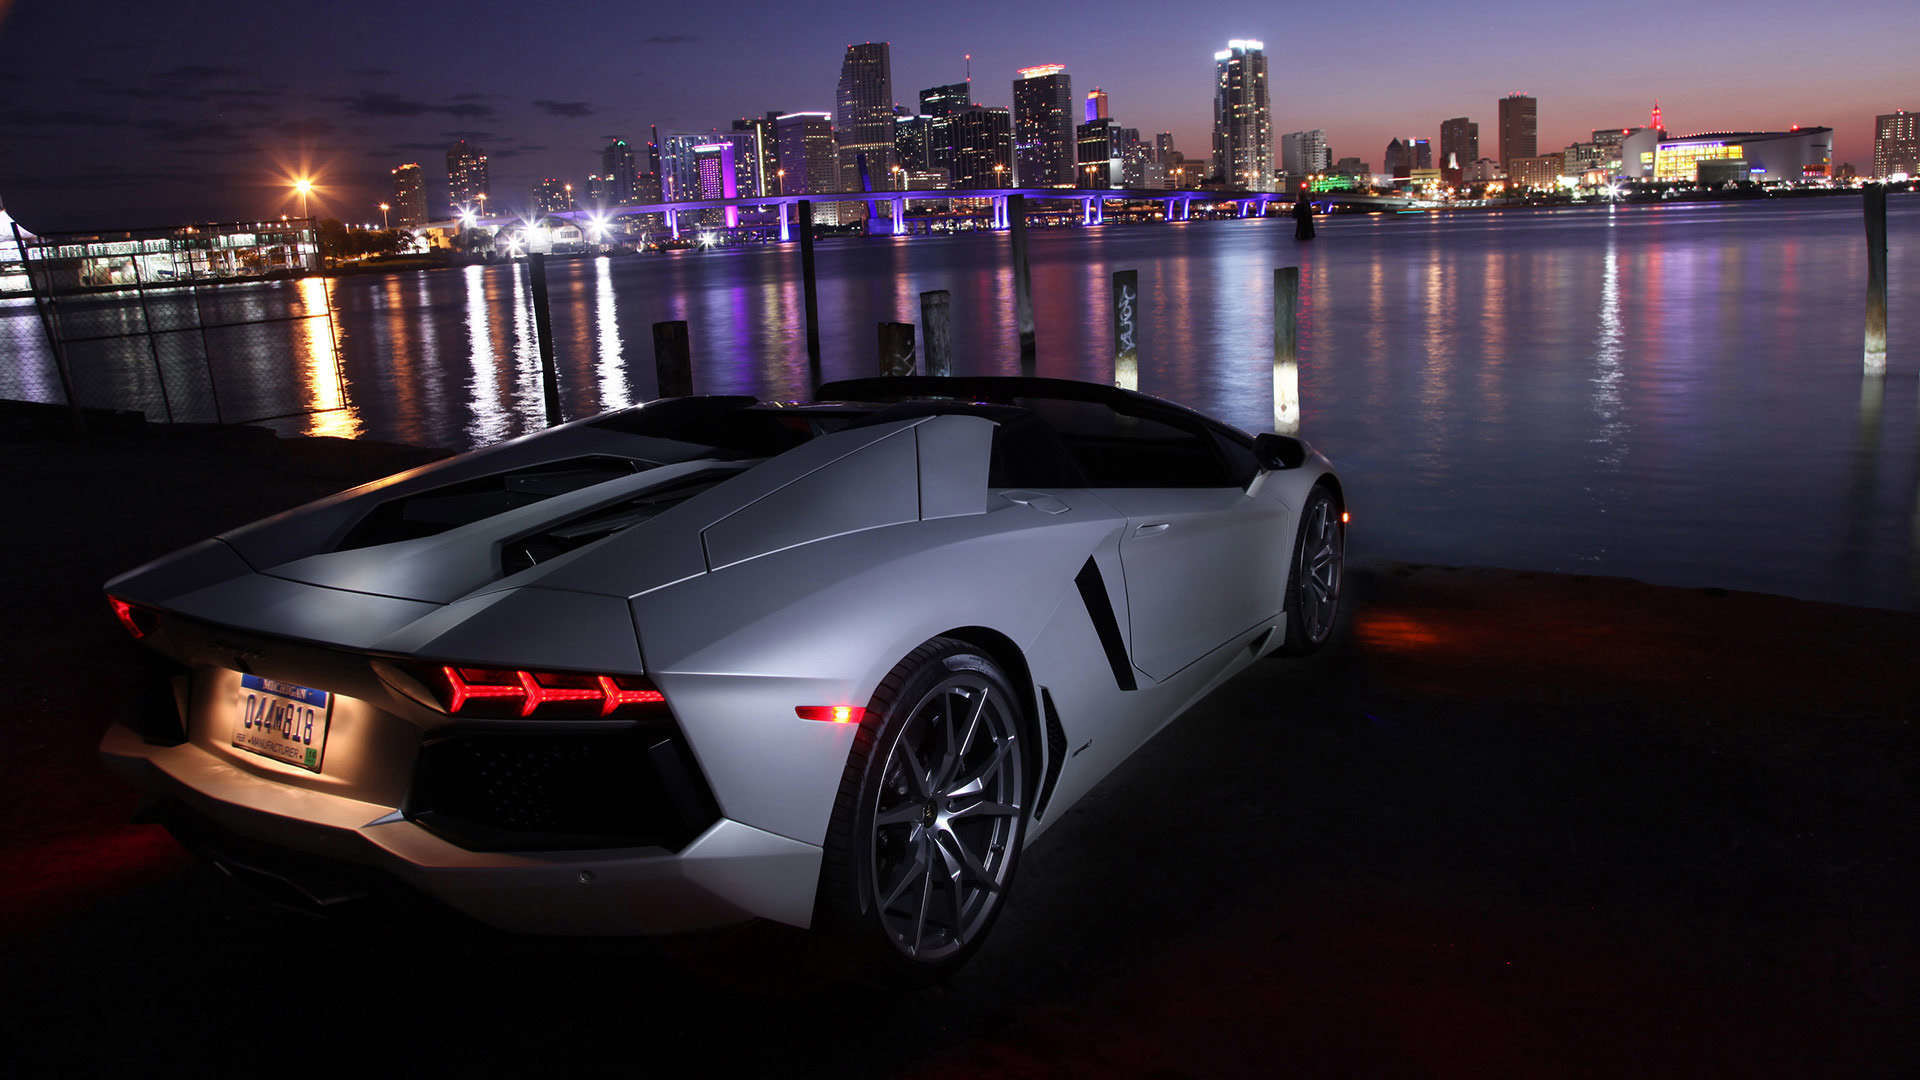 Wallpaper Full Hd 1080p Lamborghini New Wallpapertag